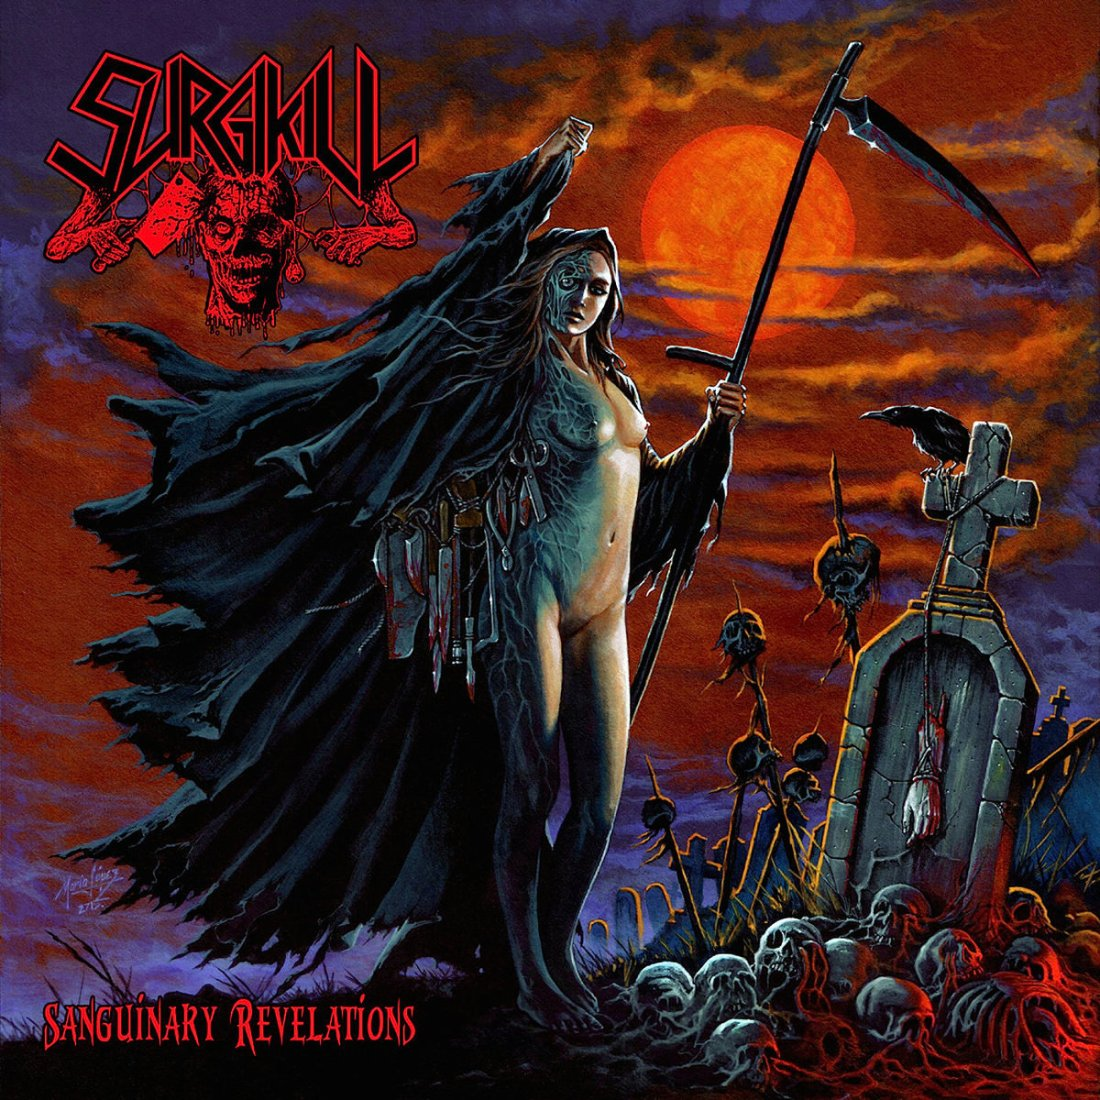 surgikill_sanguinary_revelations